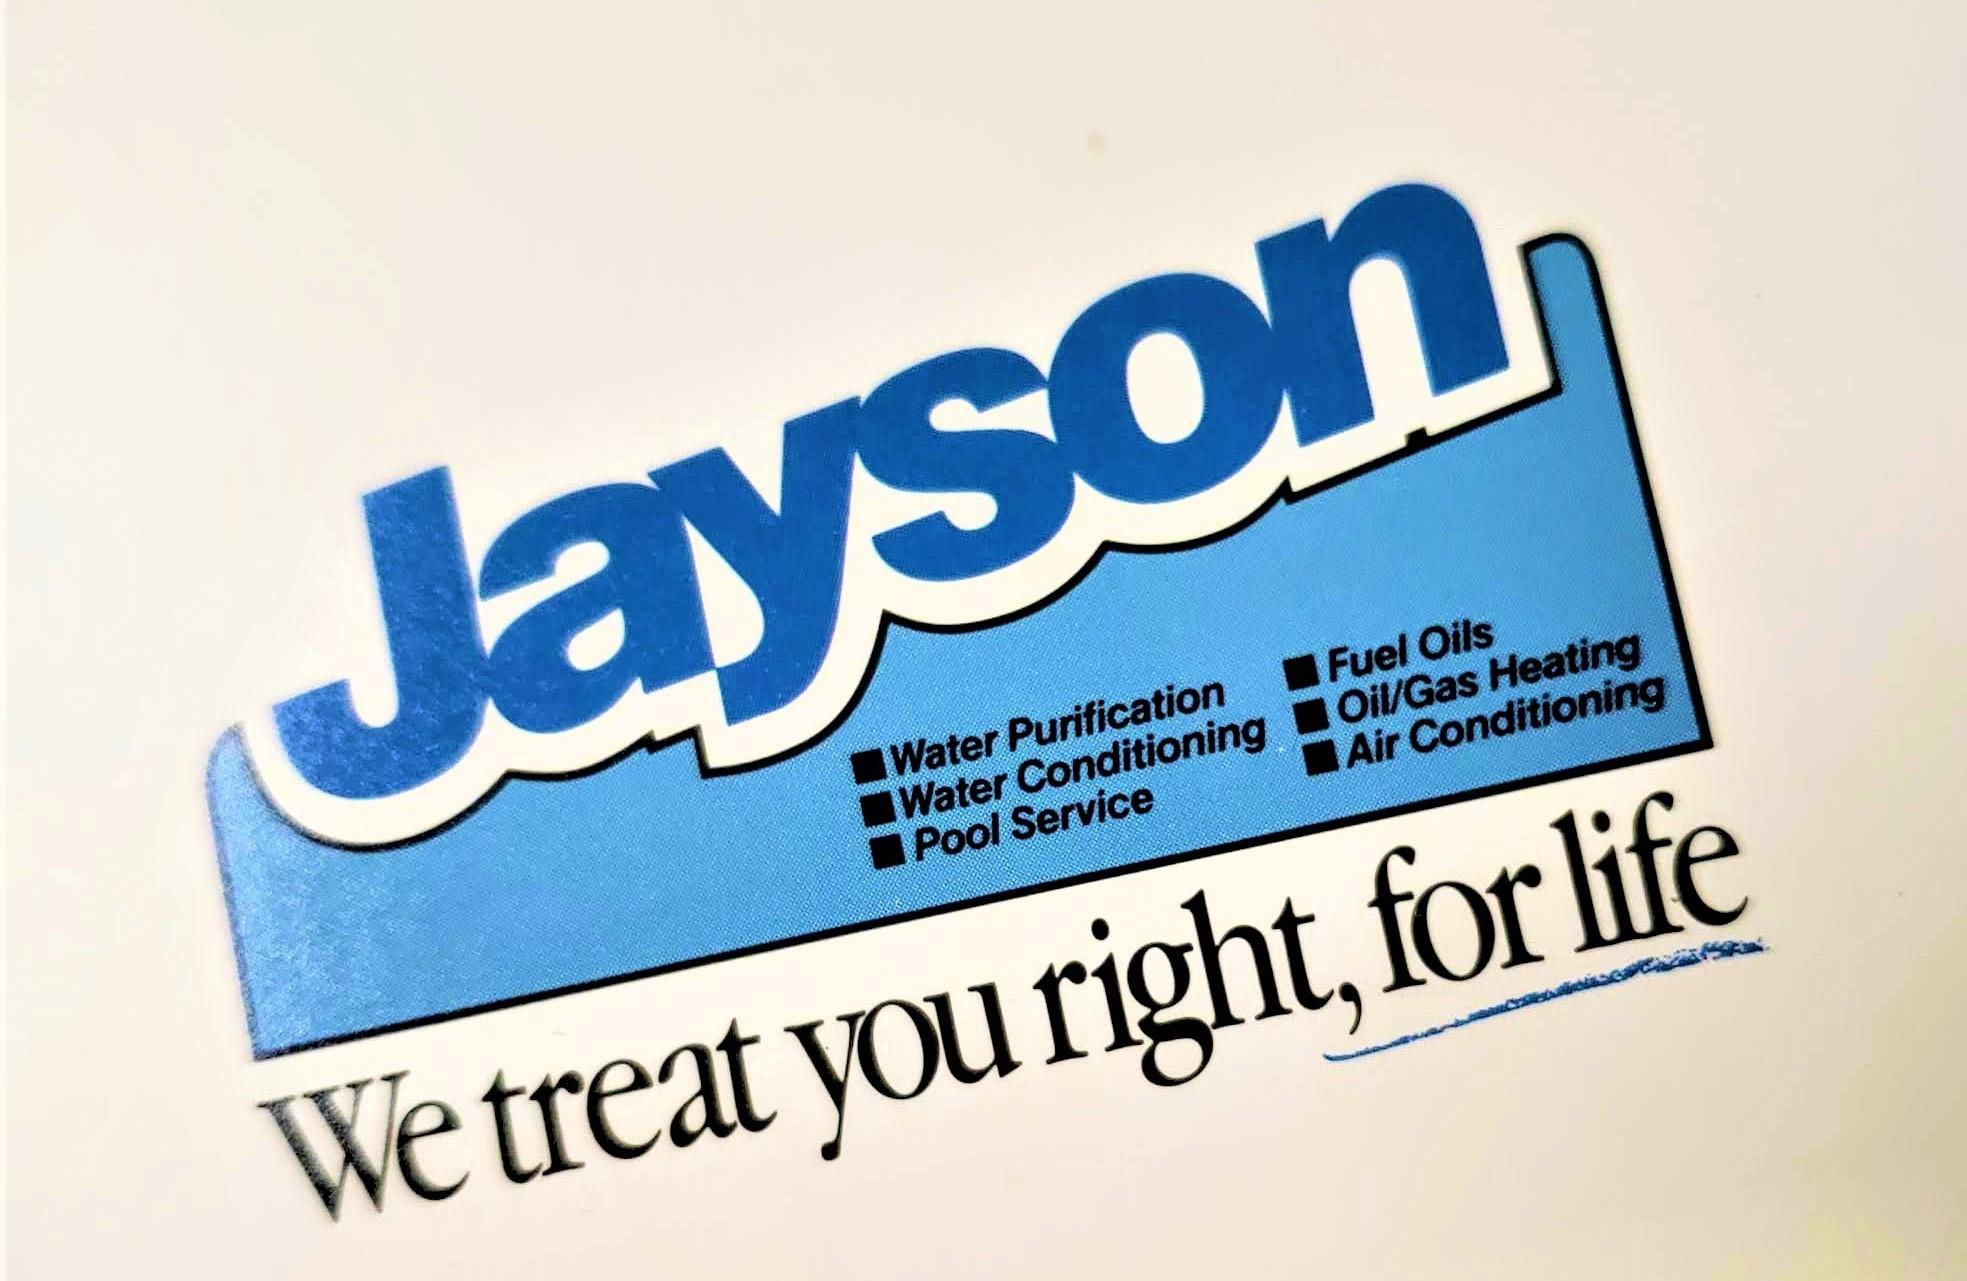 jayson_slogan_4